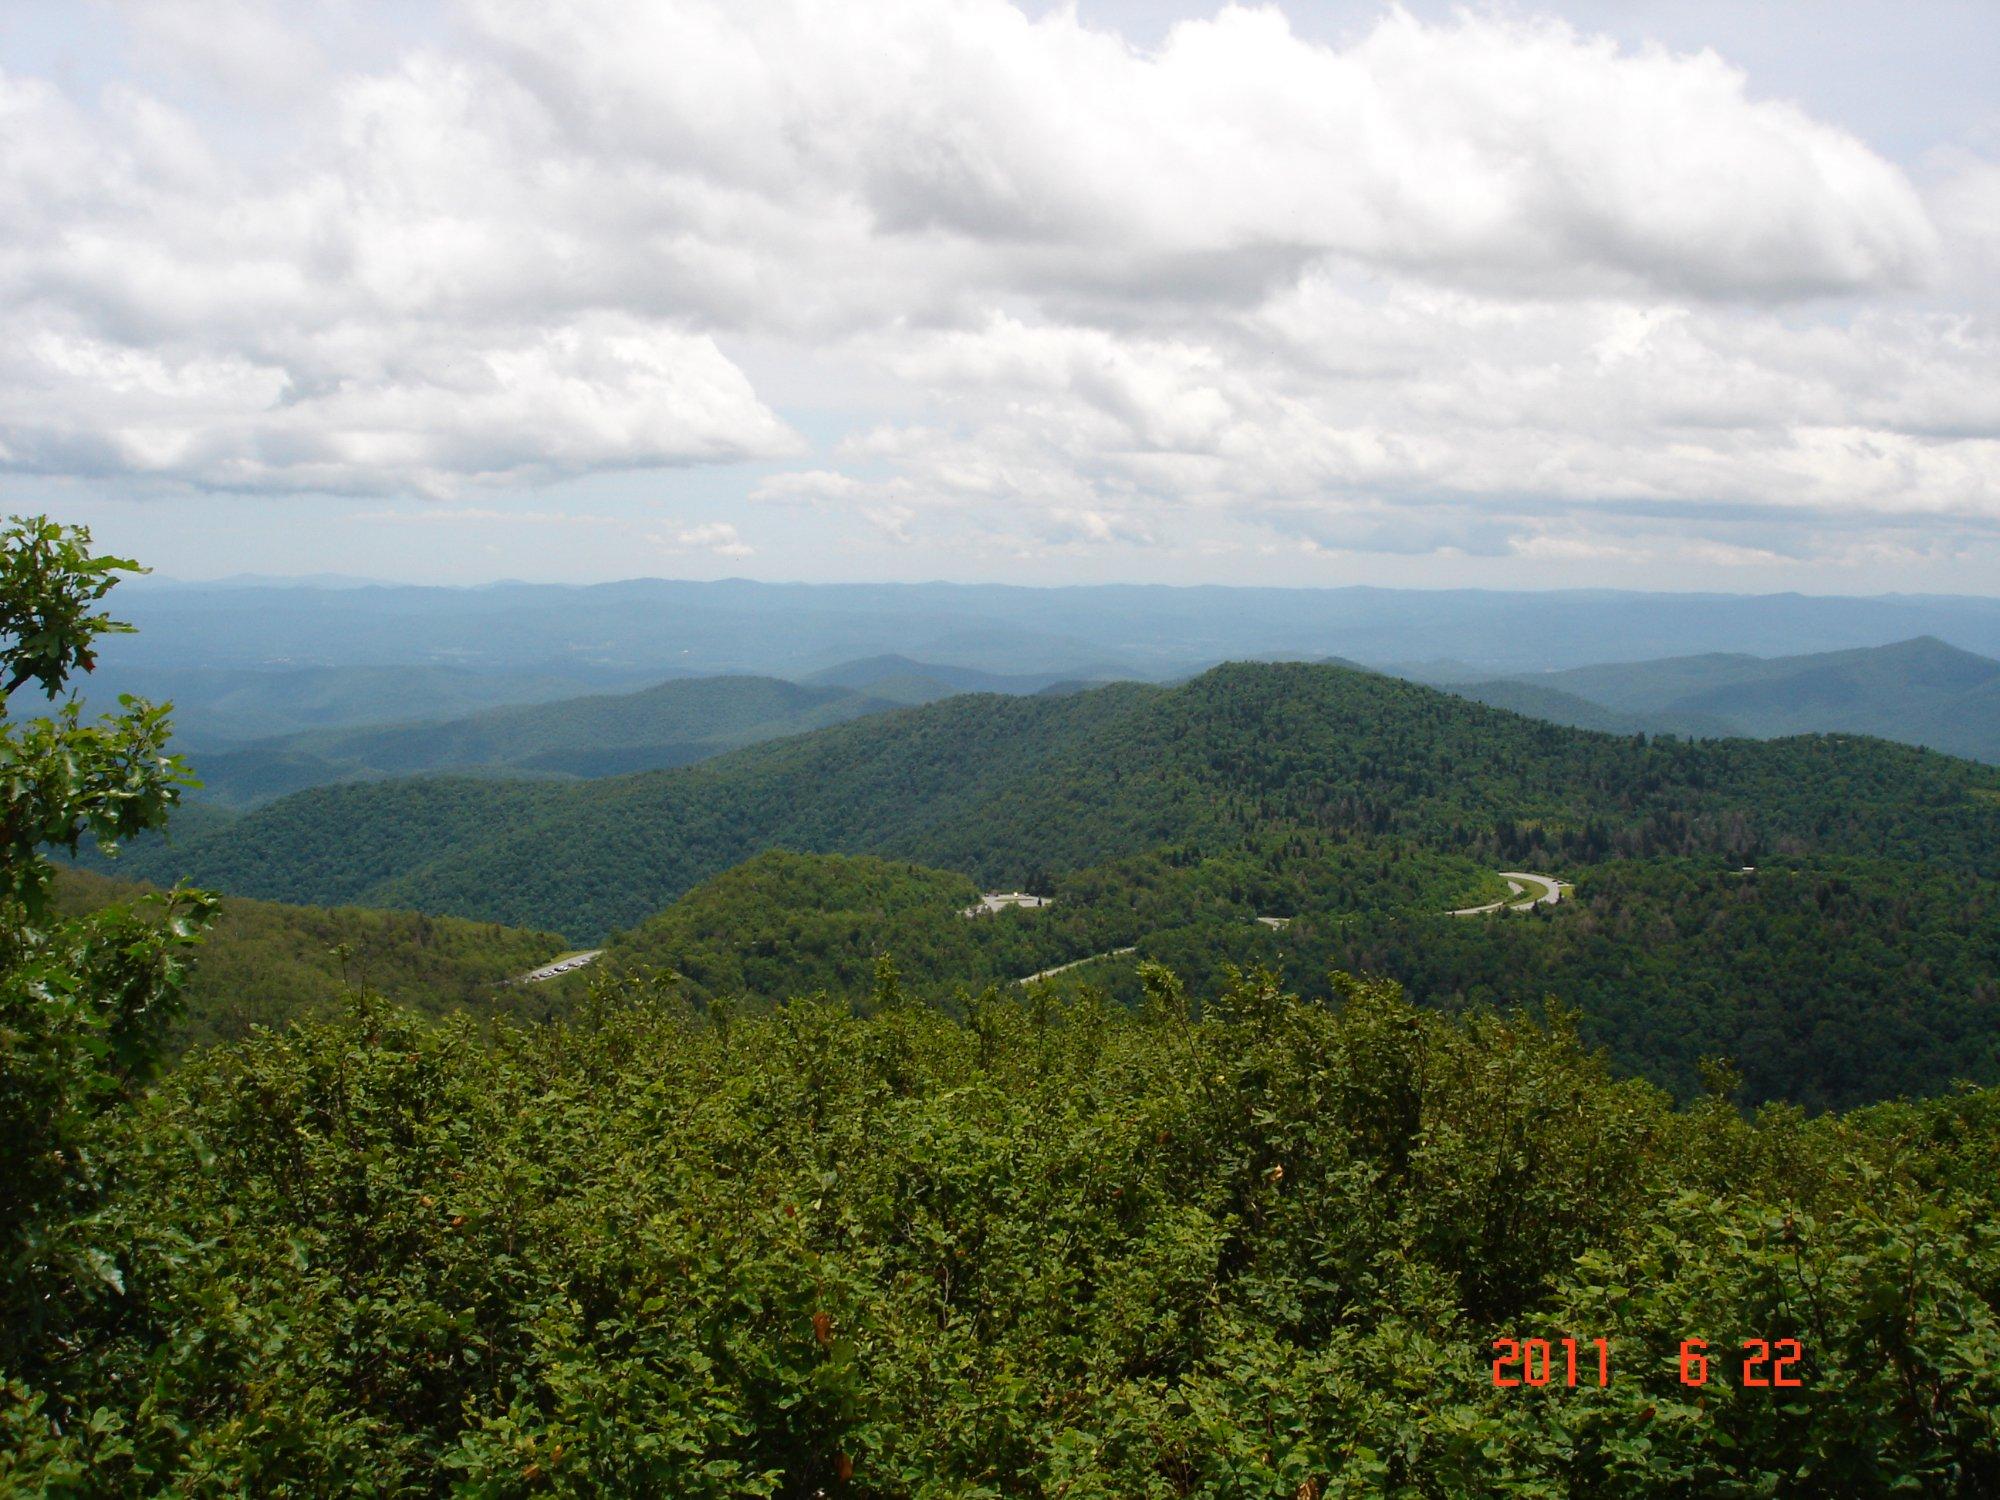 At the top of Mt. Pisgah